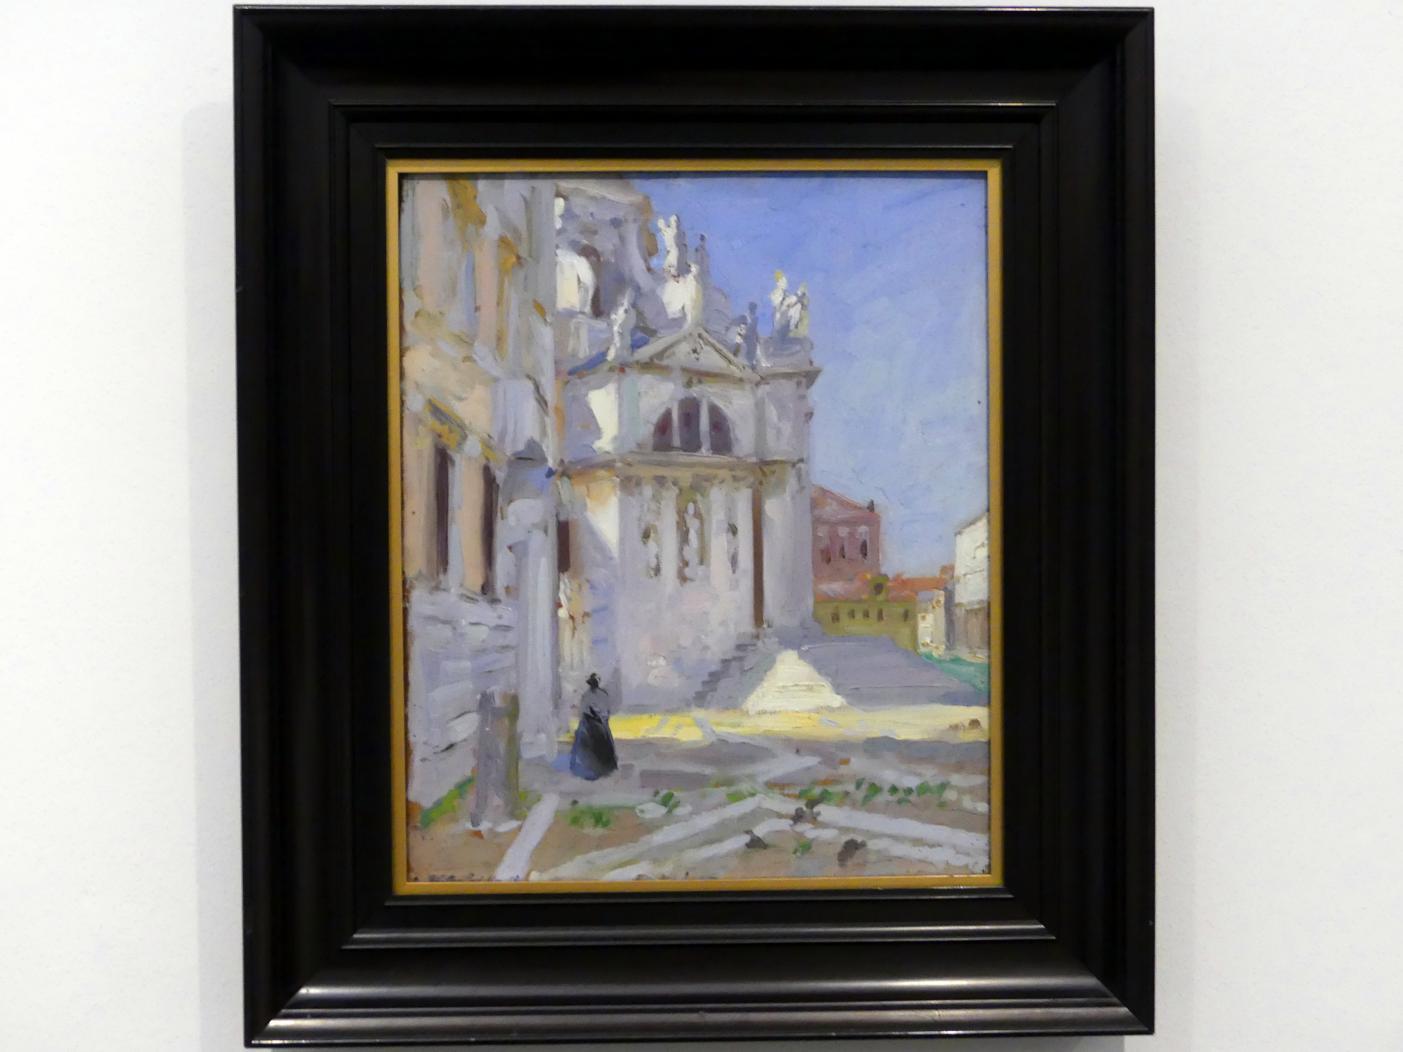 Francis Campbell Boileau Cadell: Blick auf Santa Maria della Salute in Venedig, 1910